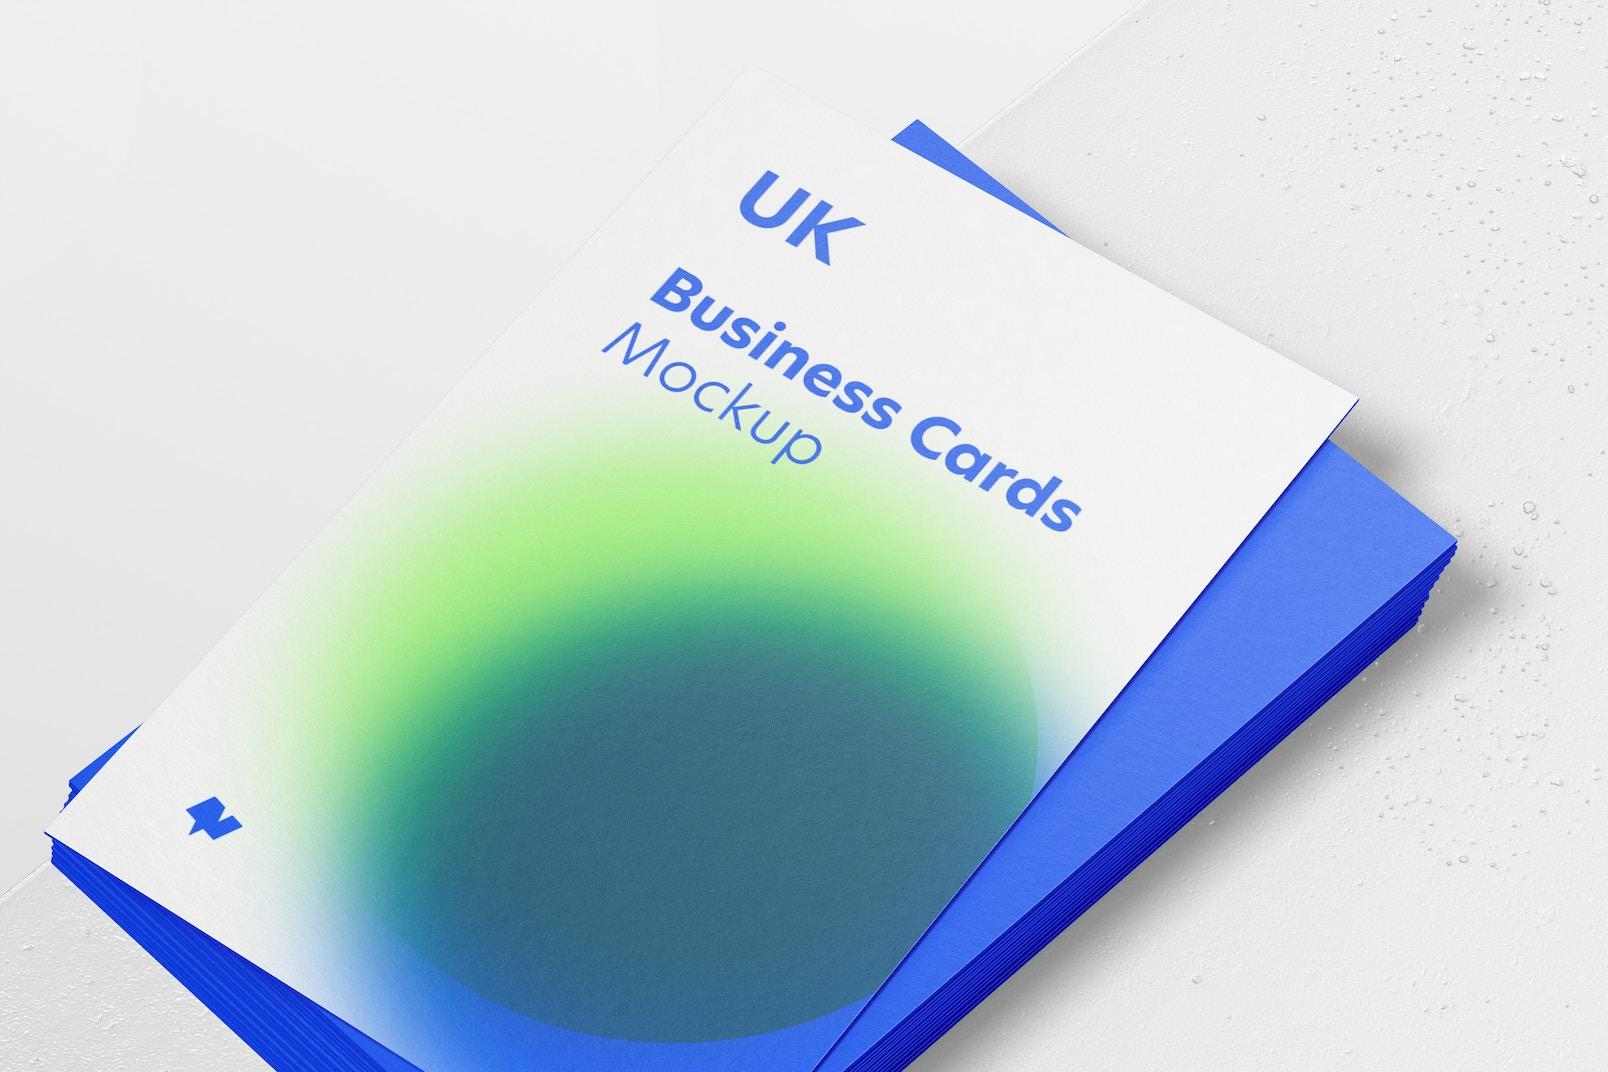 UK Portrait Business Cards Mockup, Close Up